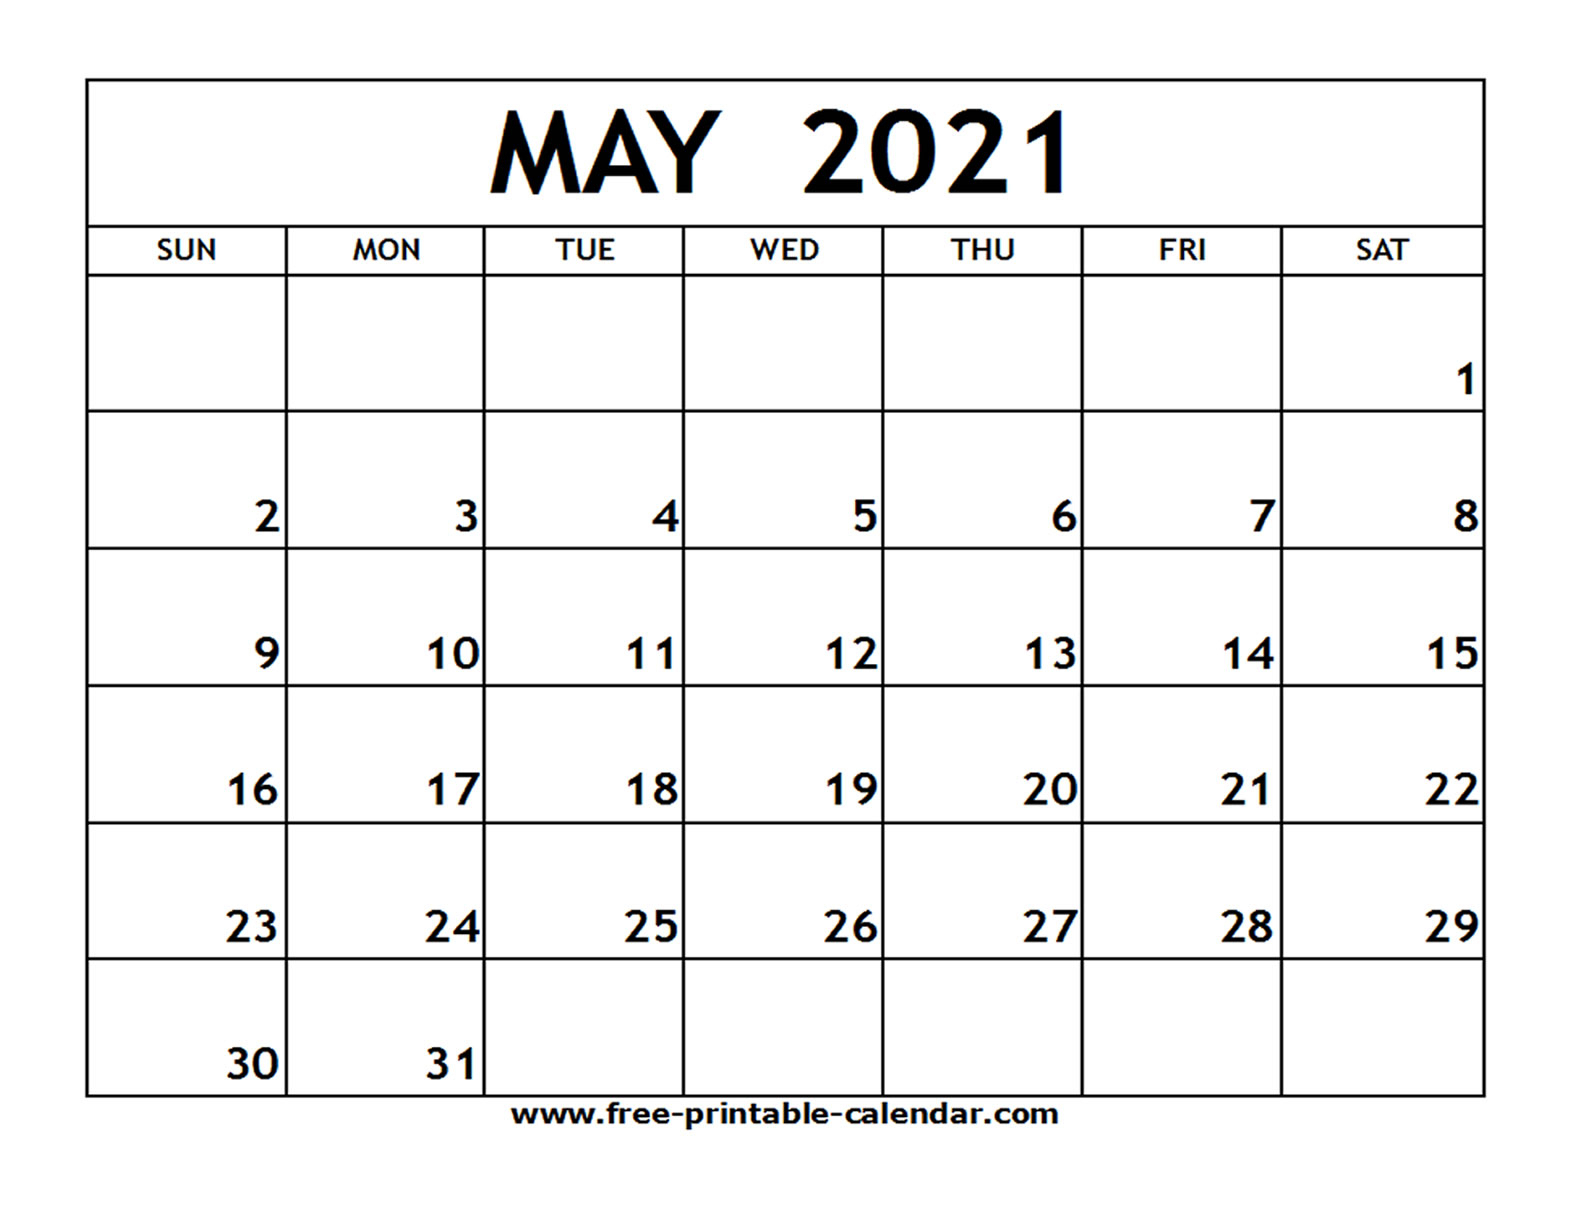 2021 Calendar Printable Pdf May | Free Printable Calendar with Free Fillable Calendar 2021